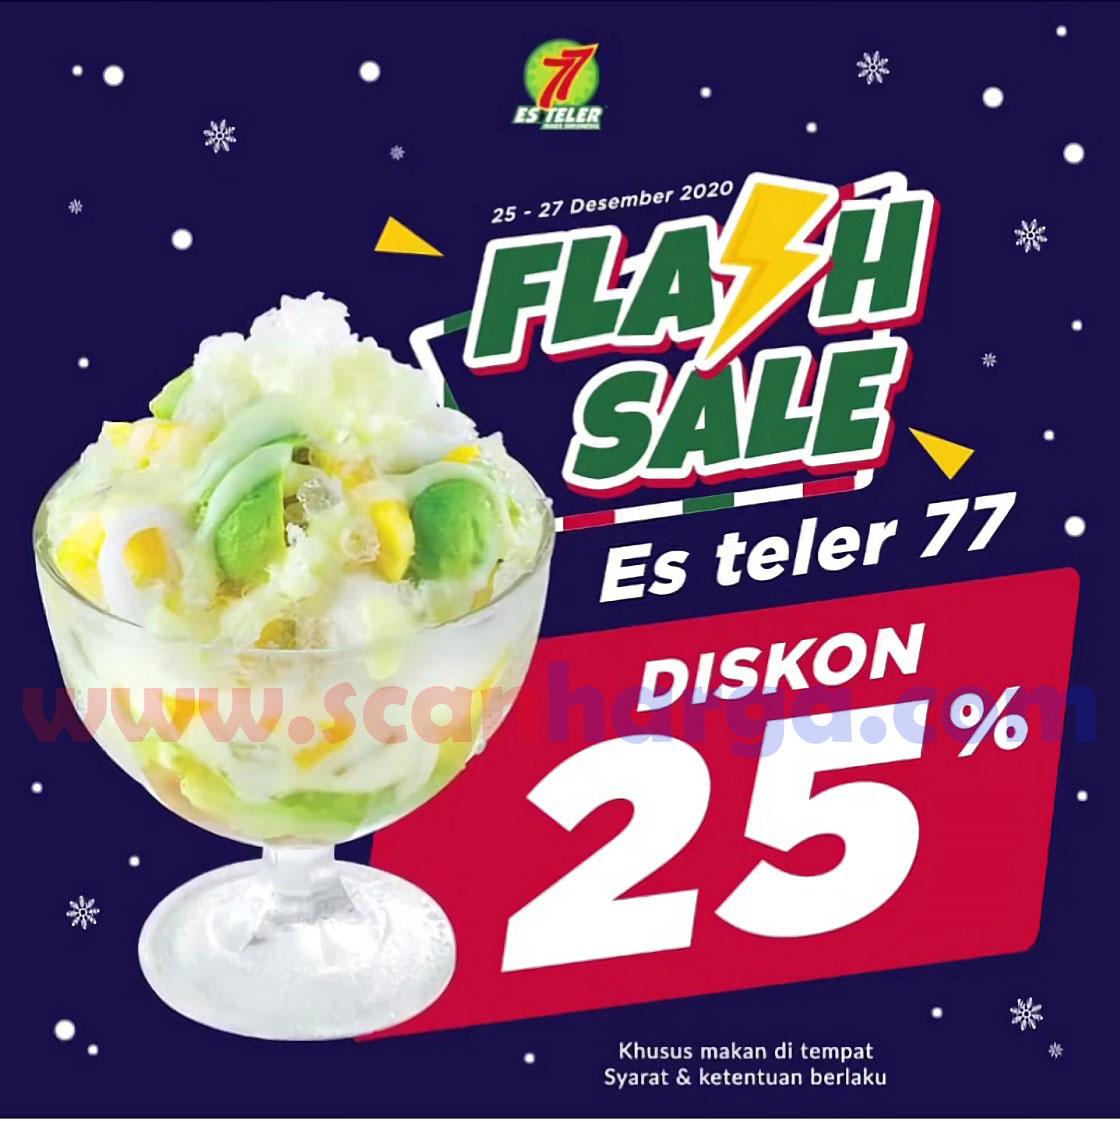 ES TELLER 77 Promo FLASH SALE – Diskon 25% untuk pembelian Es Teler